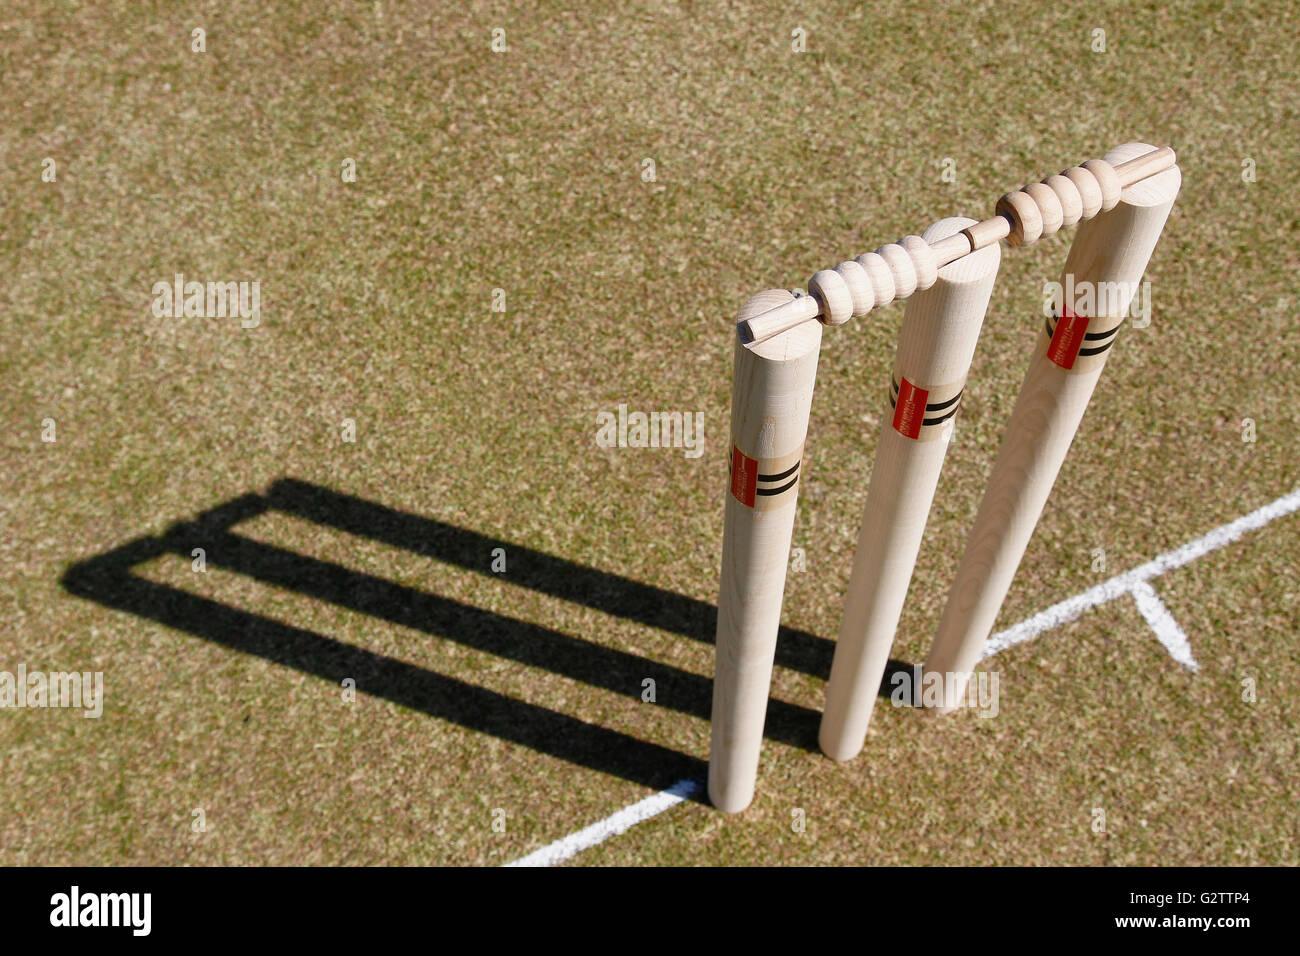 Deportes, pelota, Cricket, tocones de madera. Imagen De Stock